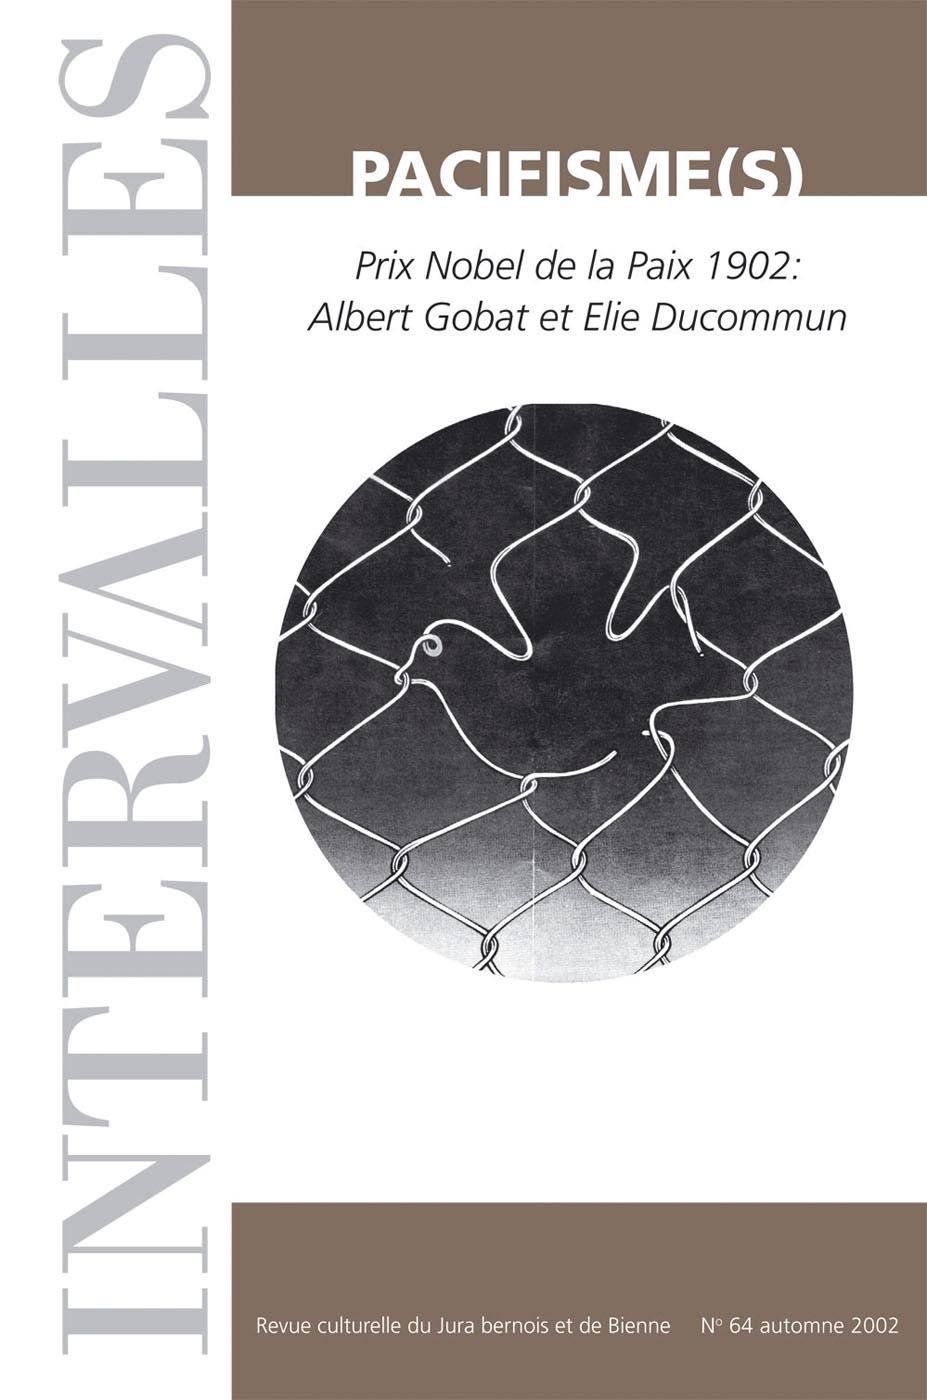 No 64 – Pacifisme(s)